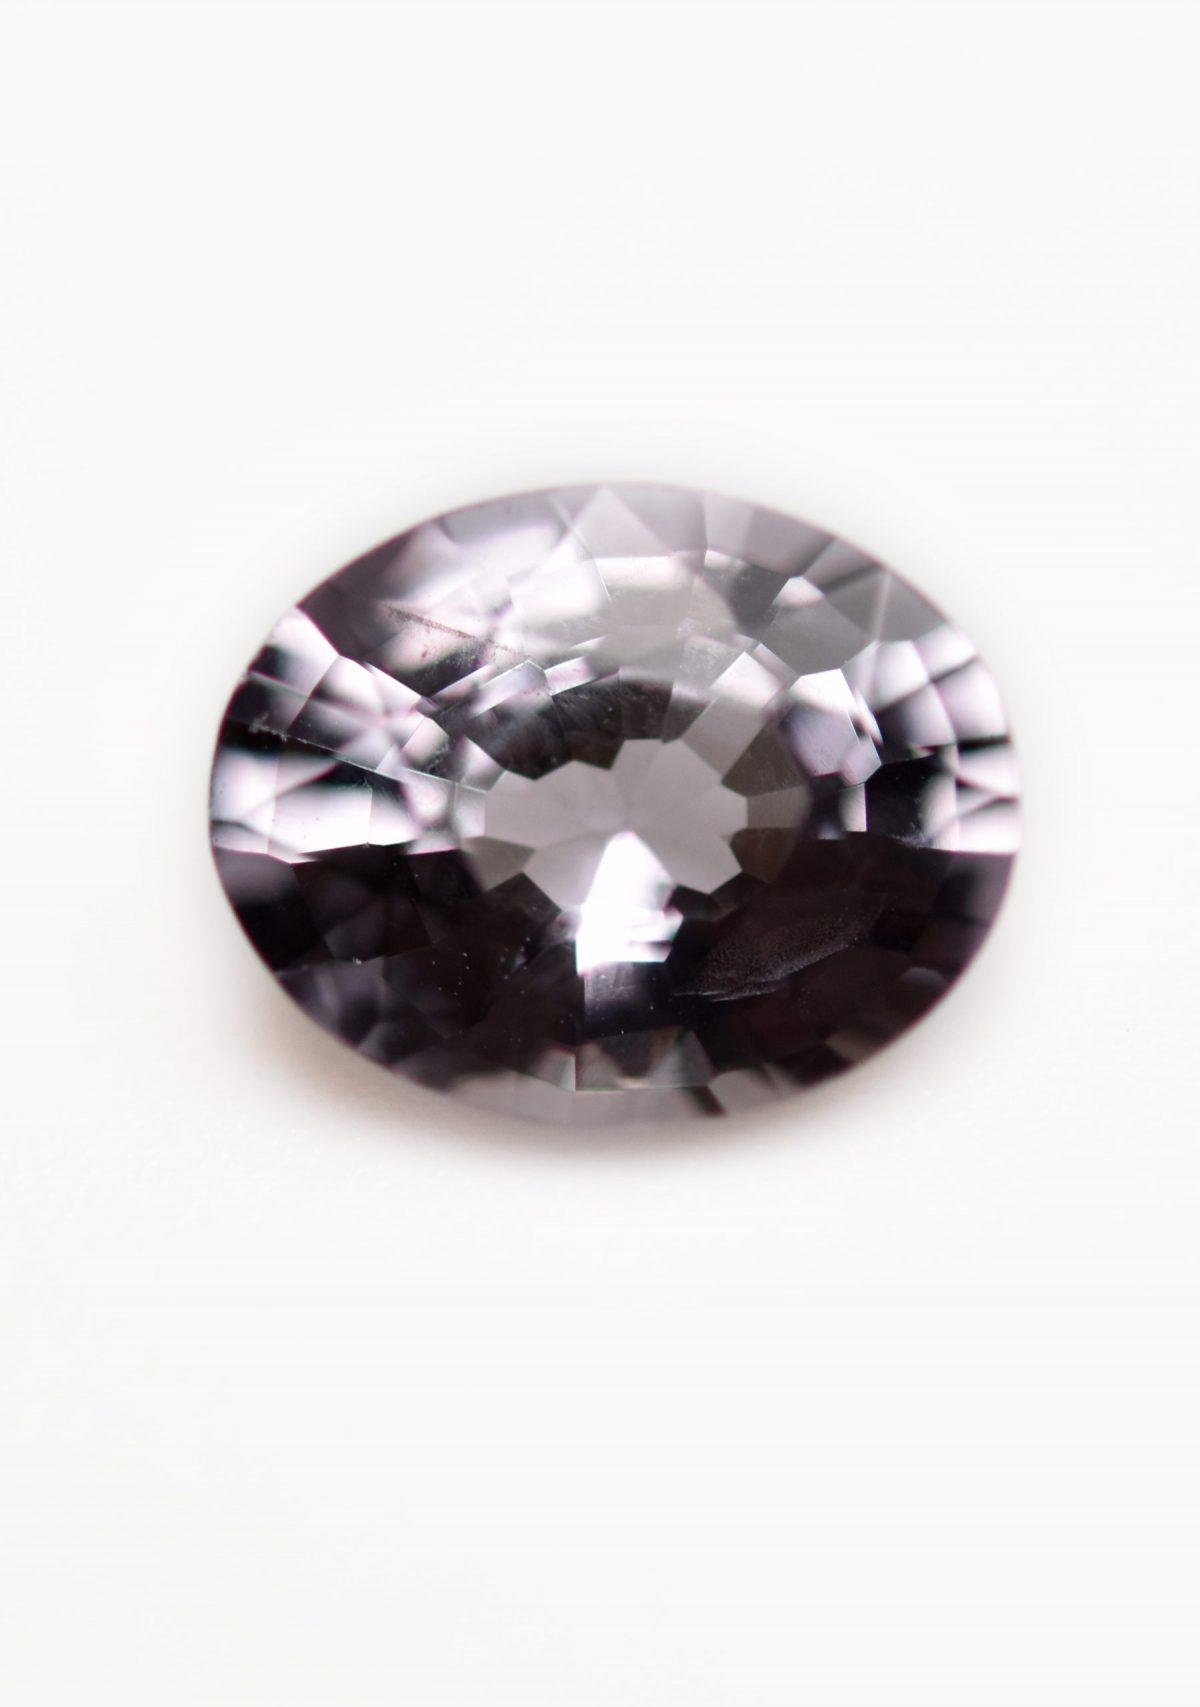 Grey Spinel Gemstone for Custom Engagement Ring